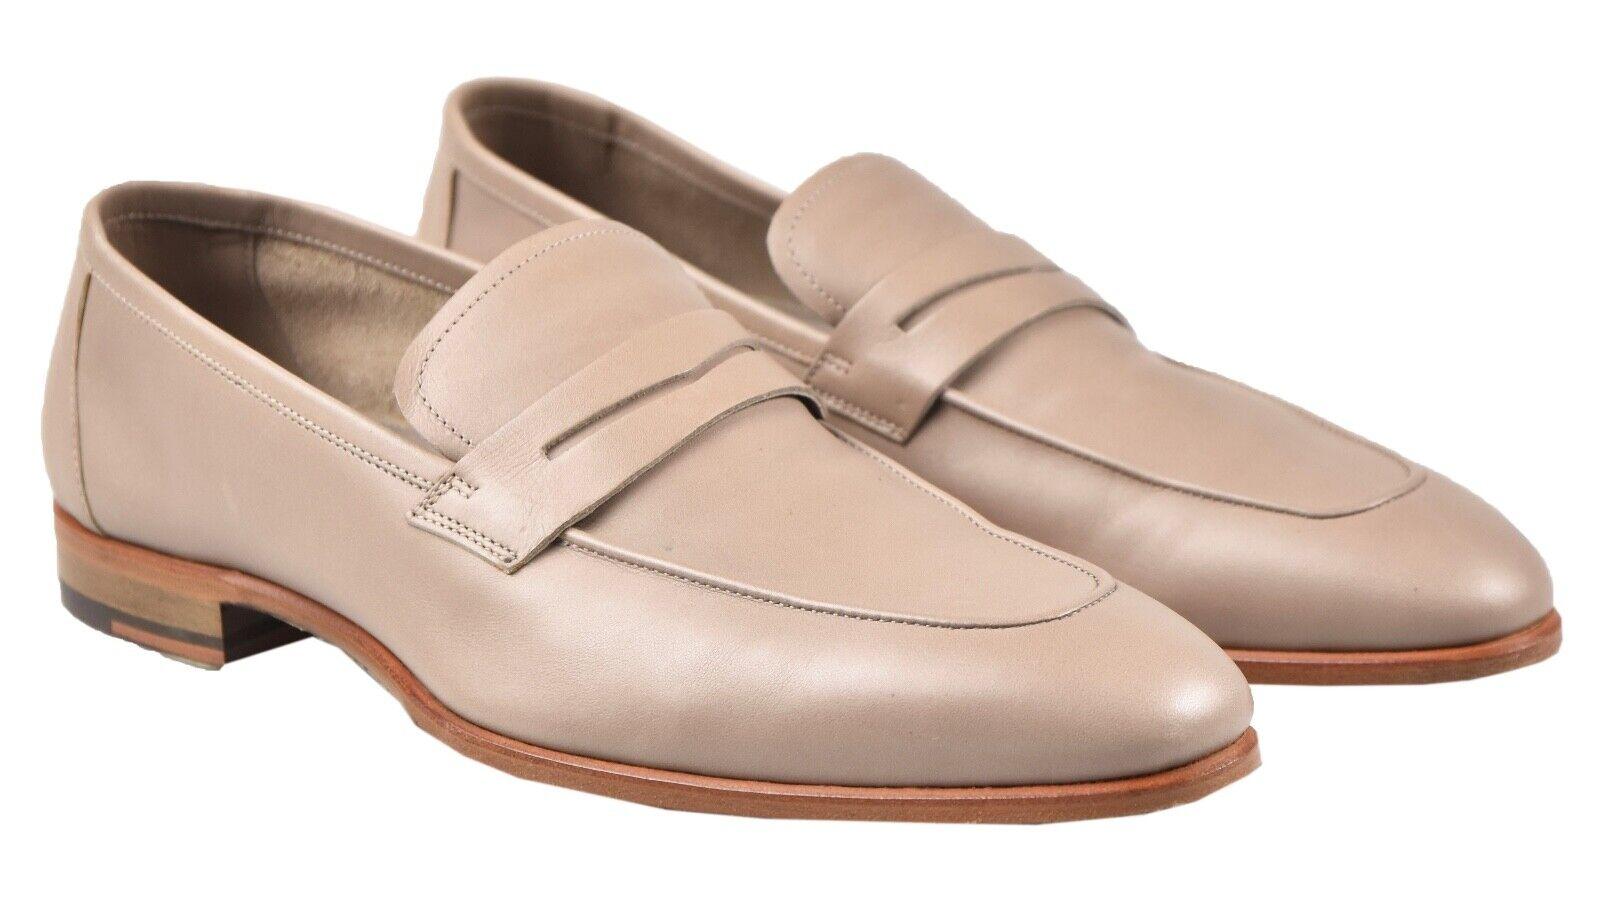 NEW KITON LOAFERS scarpe 100% LEATHER SZ 6 US 39 EU 19O128